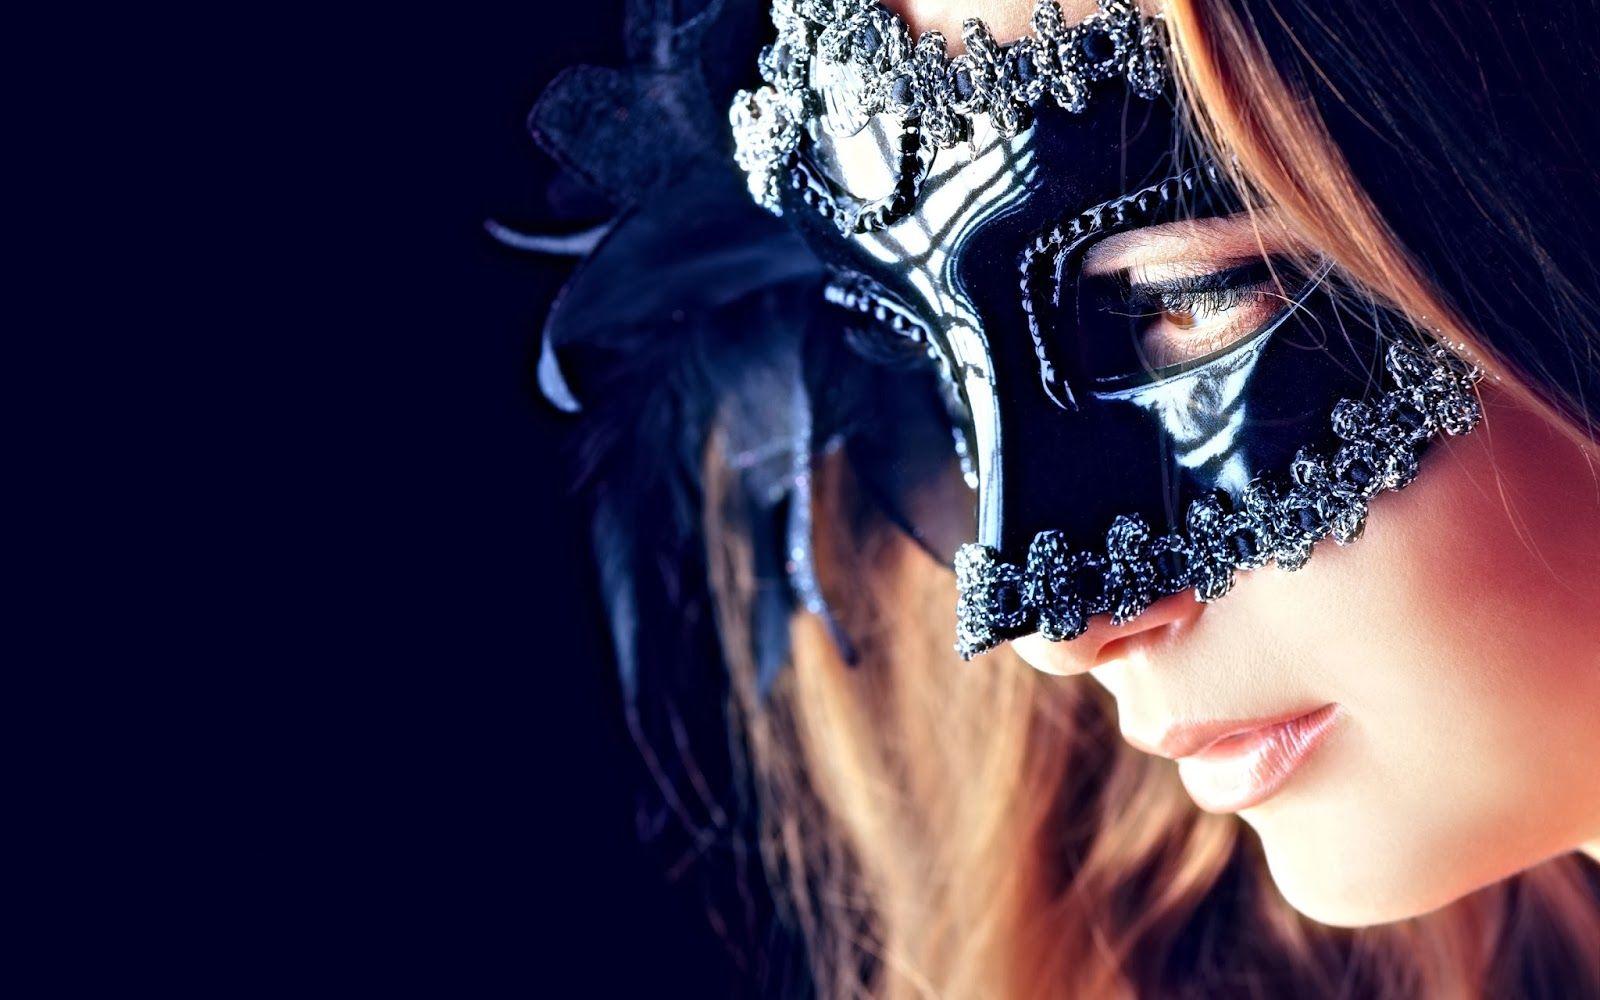 Girl With Beautiful Black Mask Hd Wallpaper W2bpinitbutton Url Http Hdwallpapersgalaxy Blogspot Com 2014 Mask Girl Mysterious Girl Mask